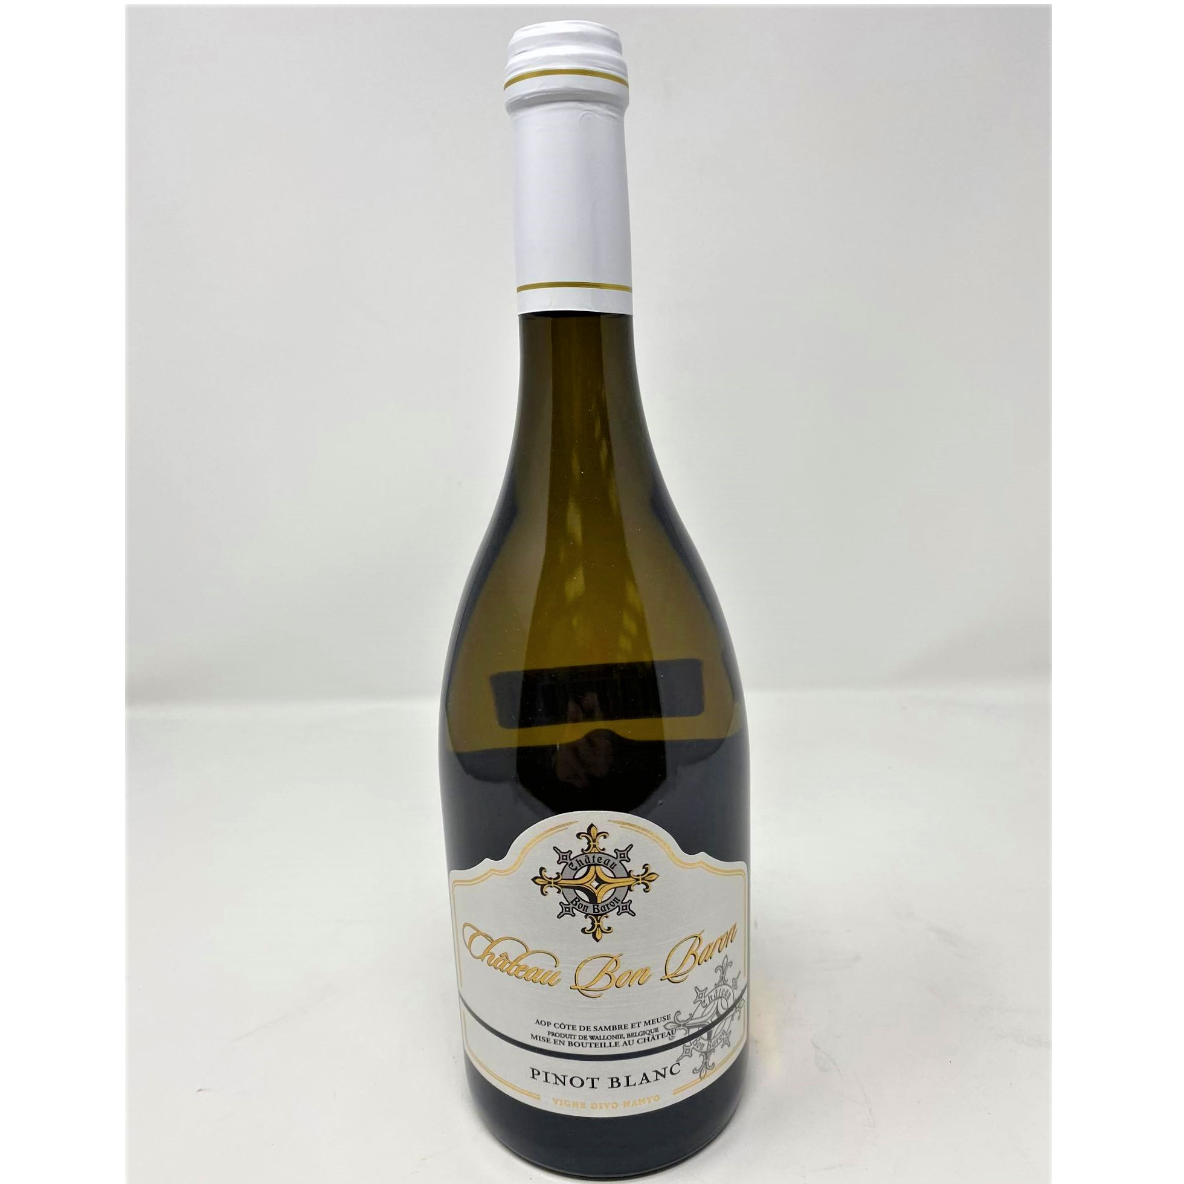 Pinot blanc Bon Bar 2016 75cl